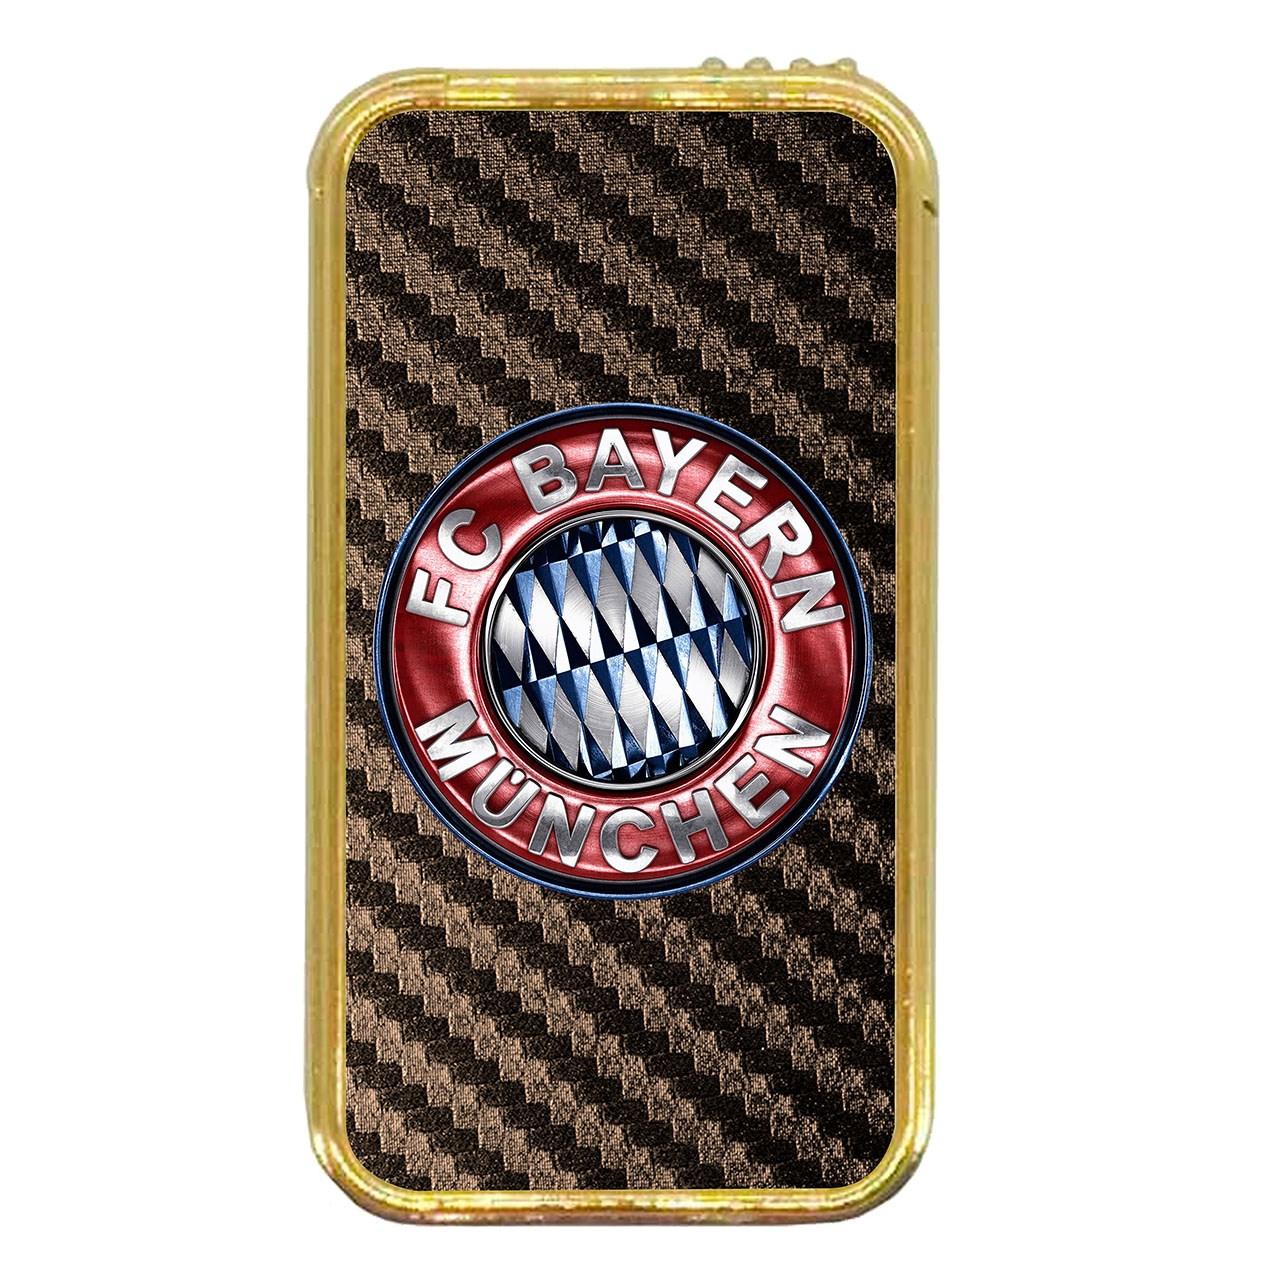 فندک لومانا مدل Bayern Munich کد UL0095